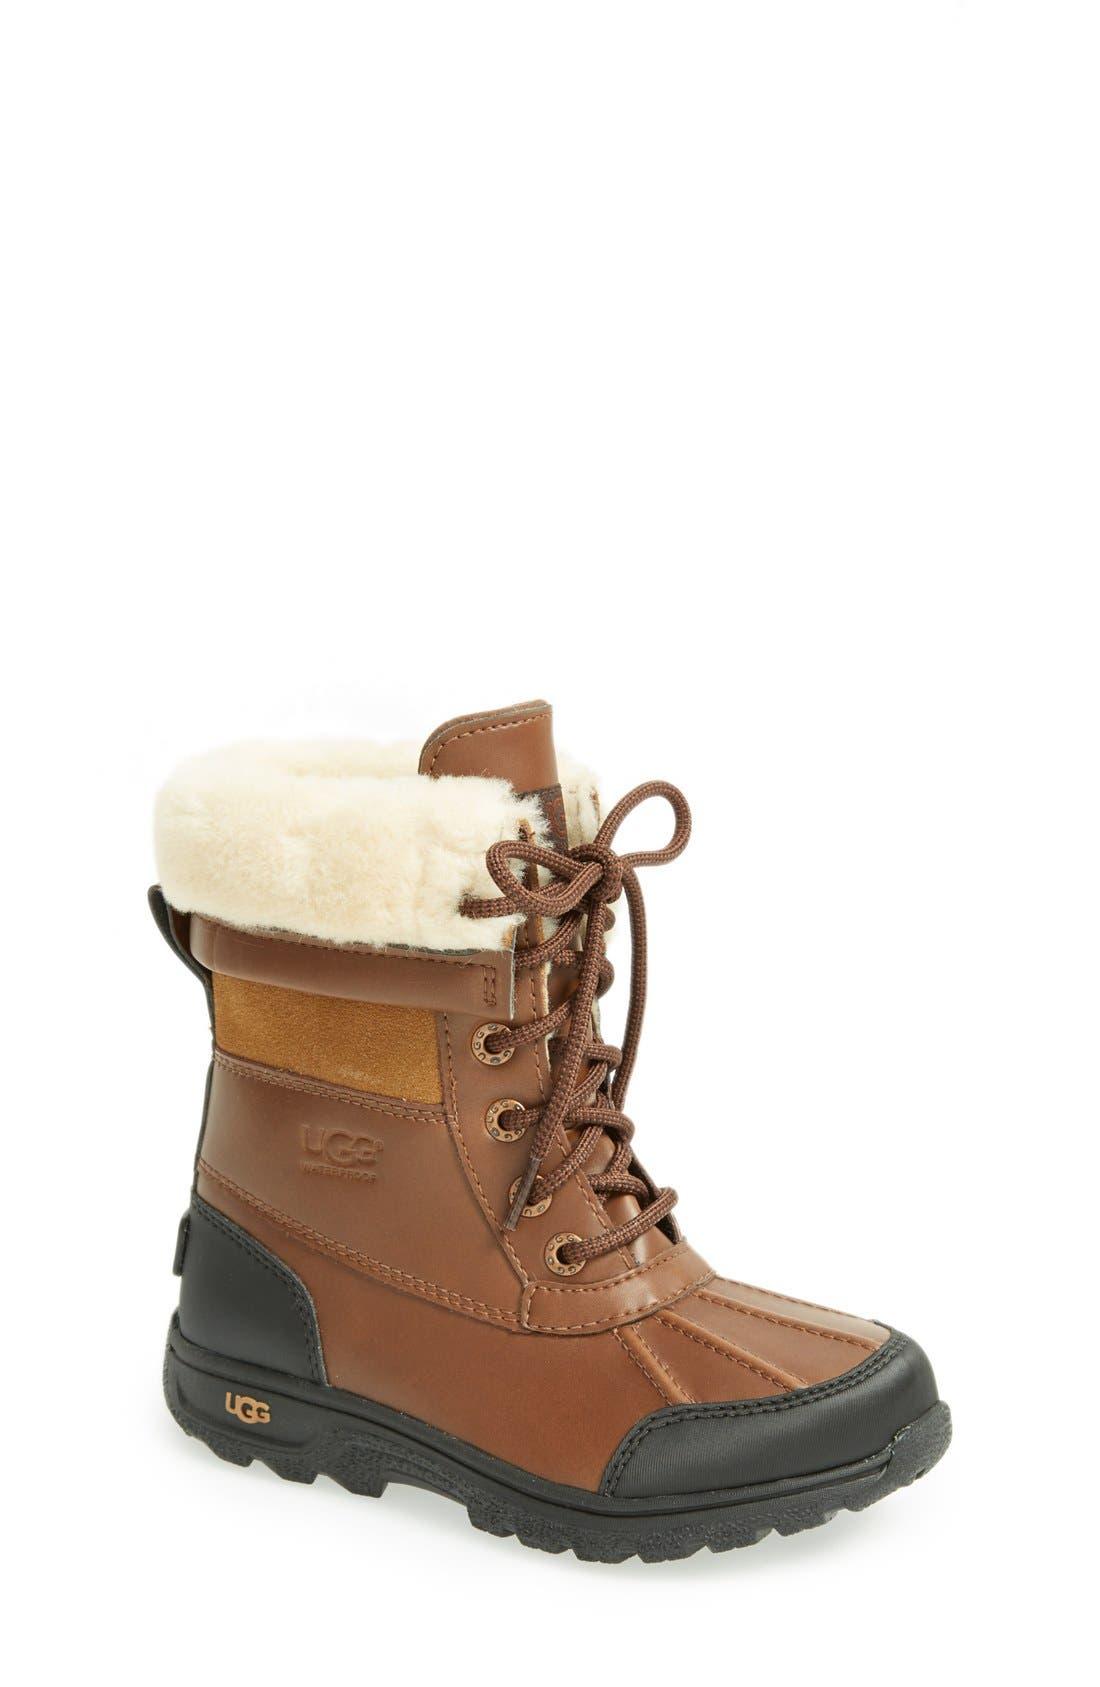 Main Image - UGG® 'Butte II' Waterproof Leather Boot (Little Kid & Big Kid)